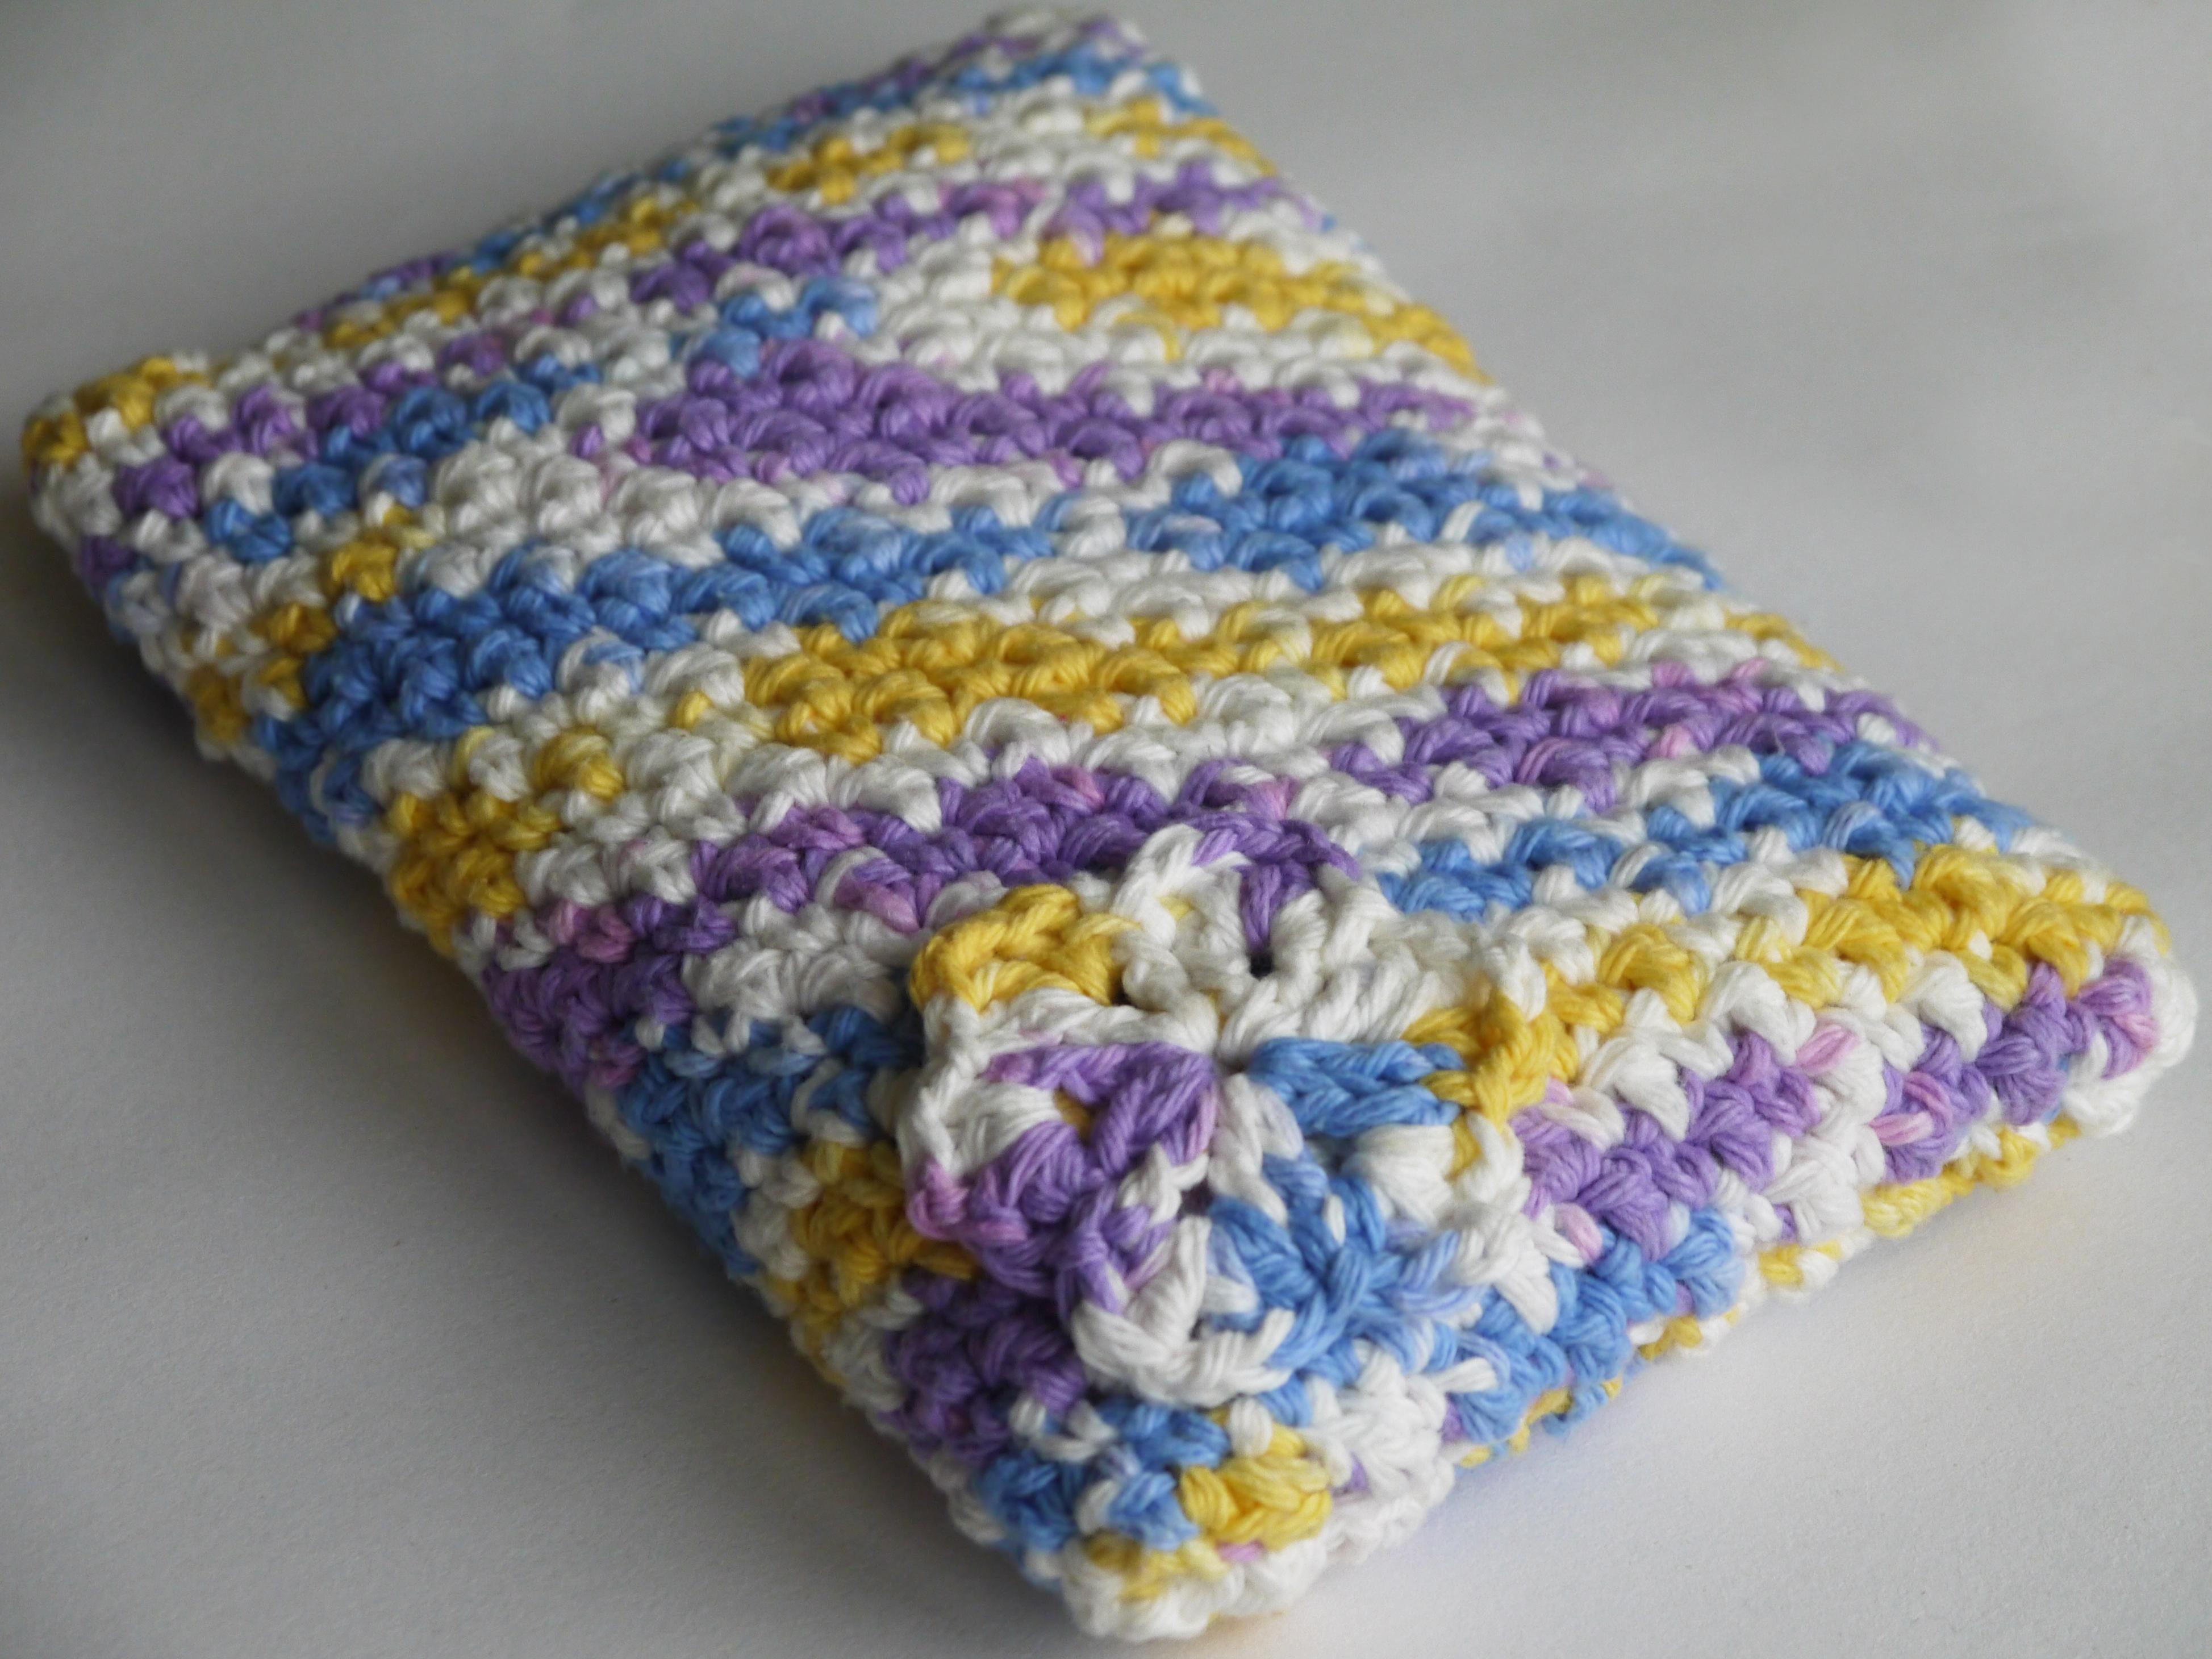 DIY Rice Bag: Free Crochet Pattern - The Crafty Feminist